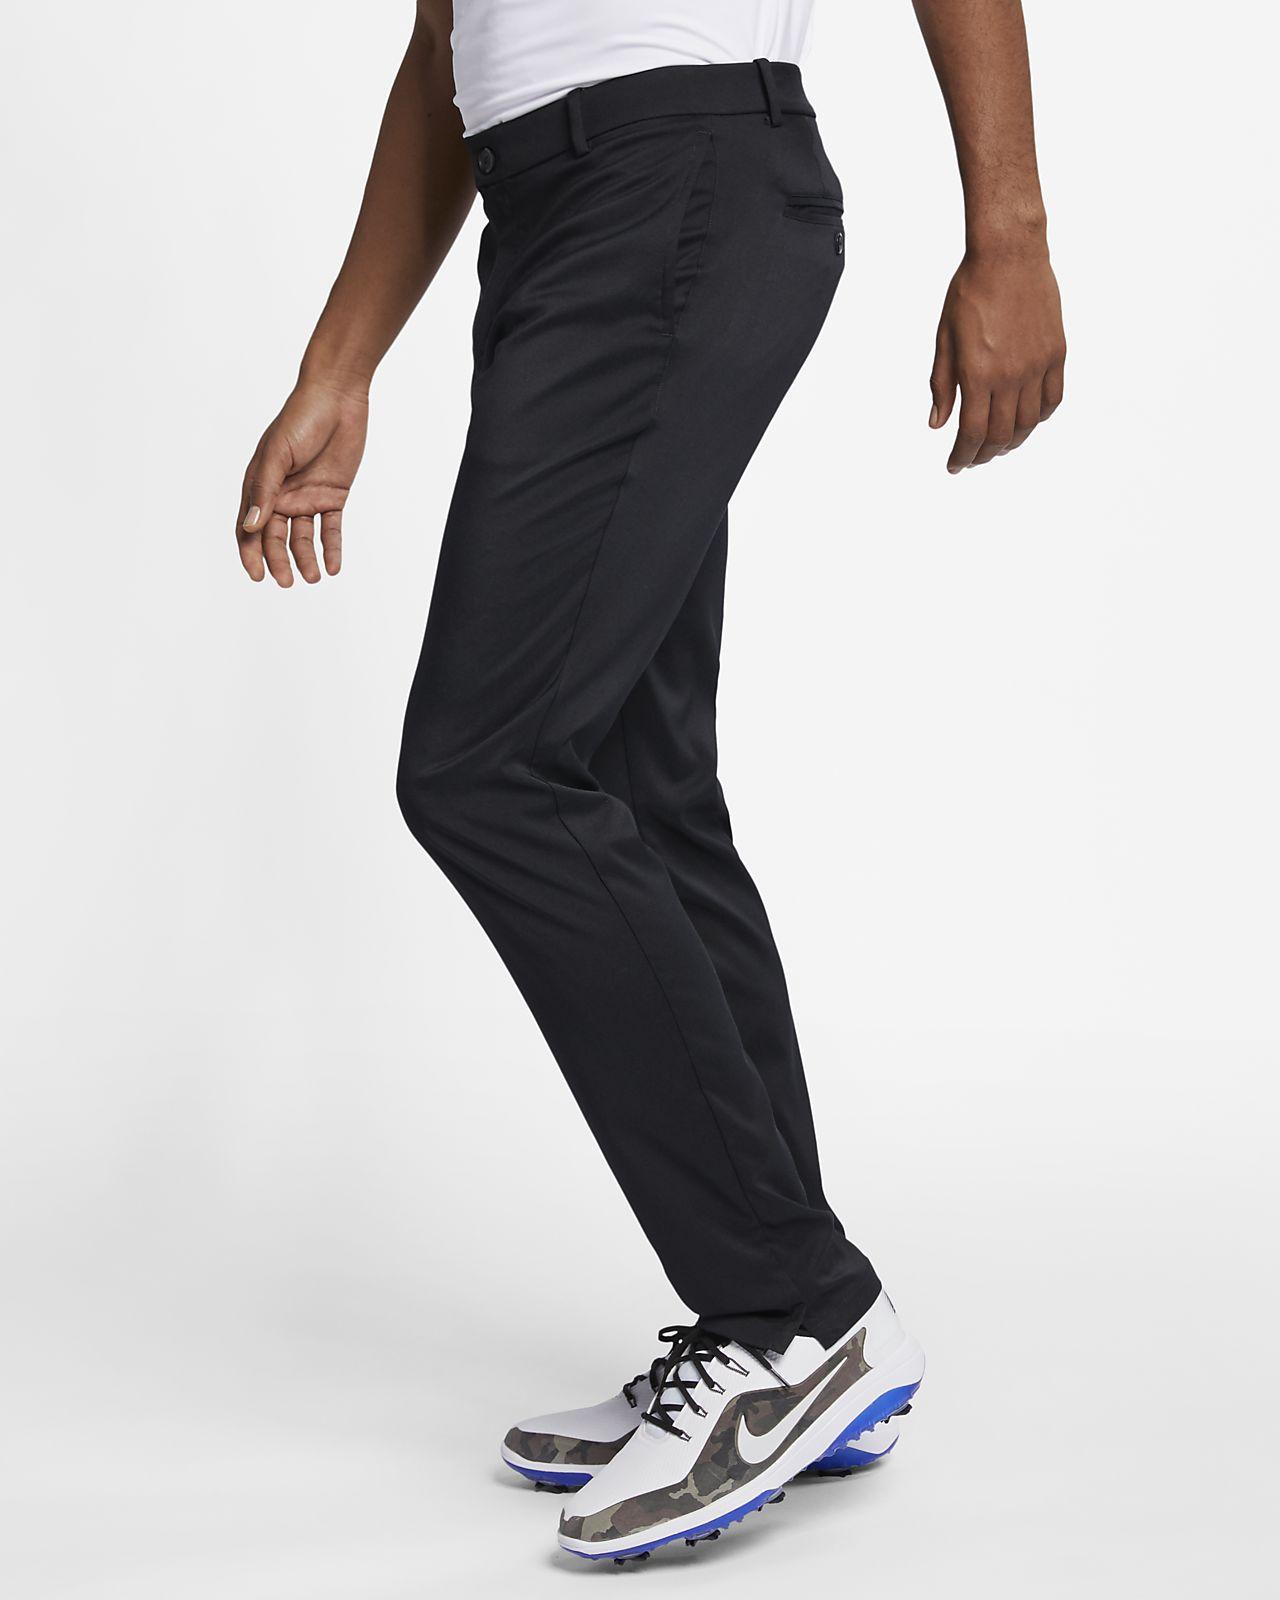 bf352b60565 Nike flex mens slim fit golf trousers jpg 1280x1600 Nike golf slim fit pant